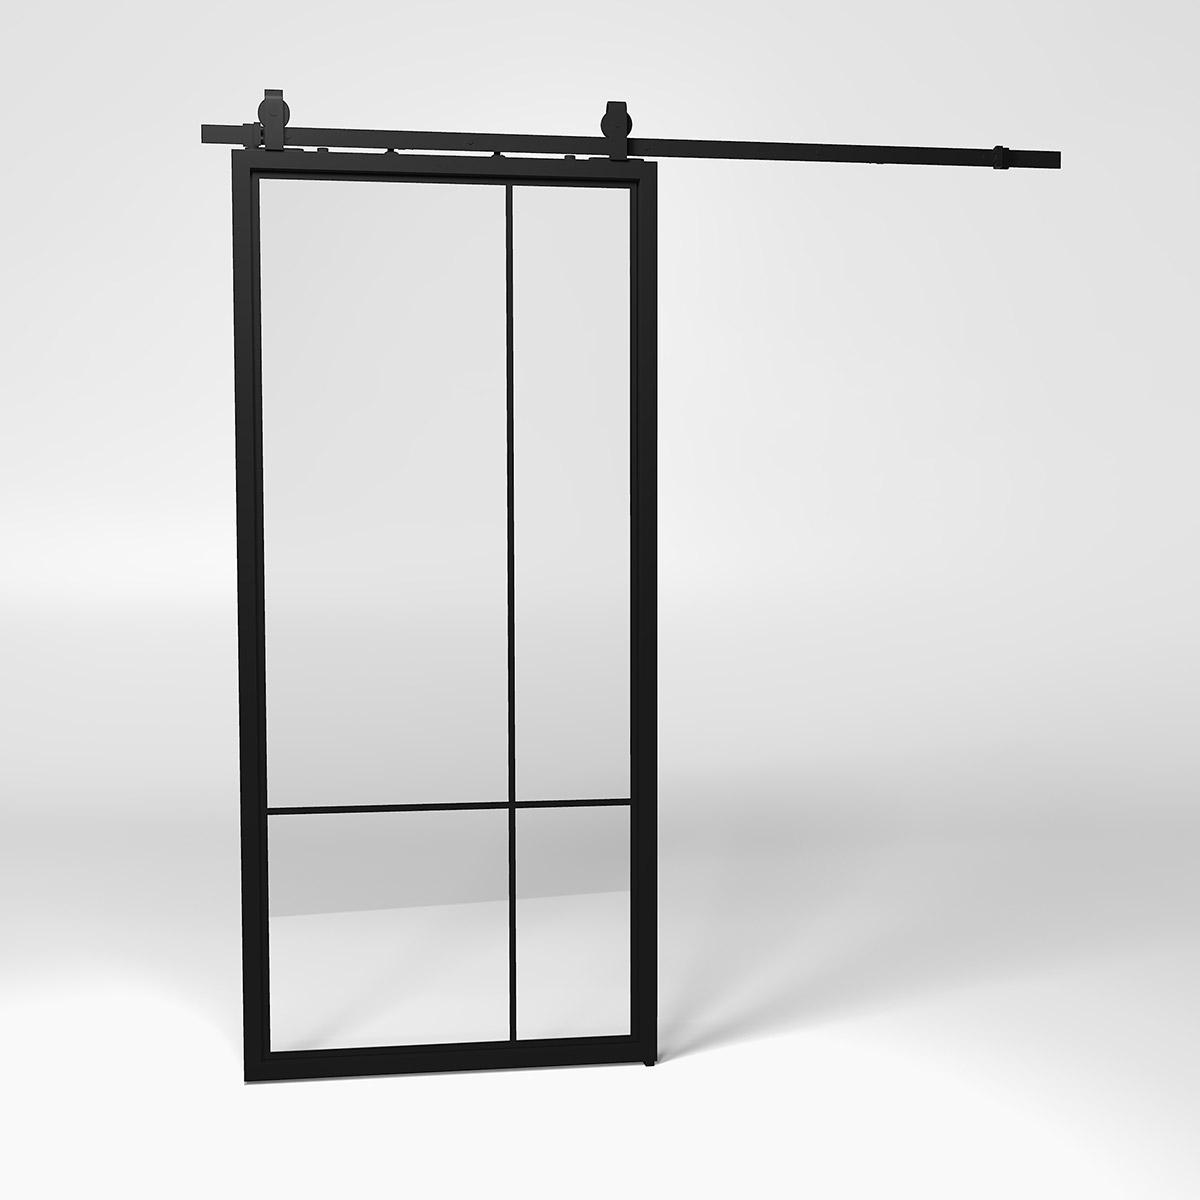 4e slide steel frame door